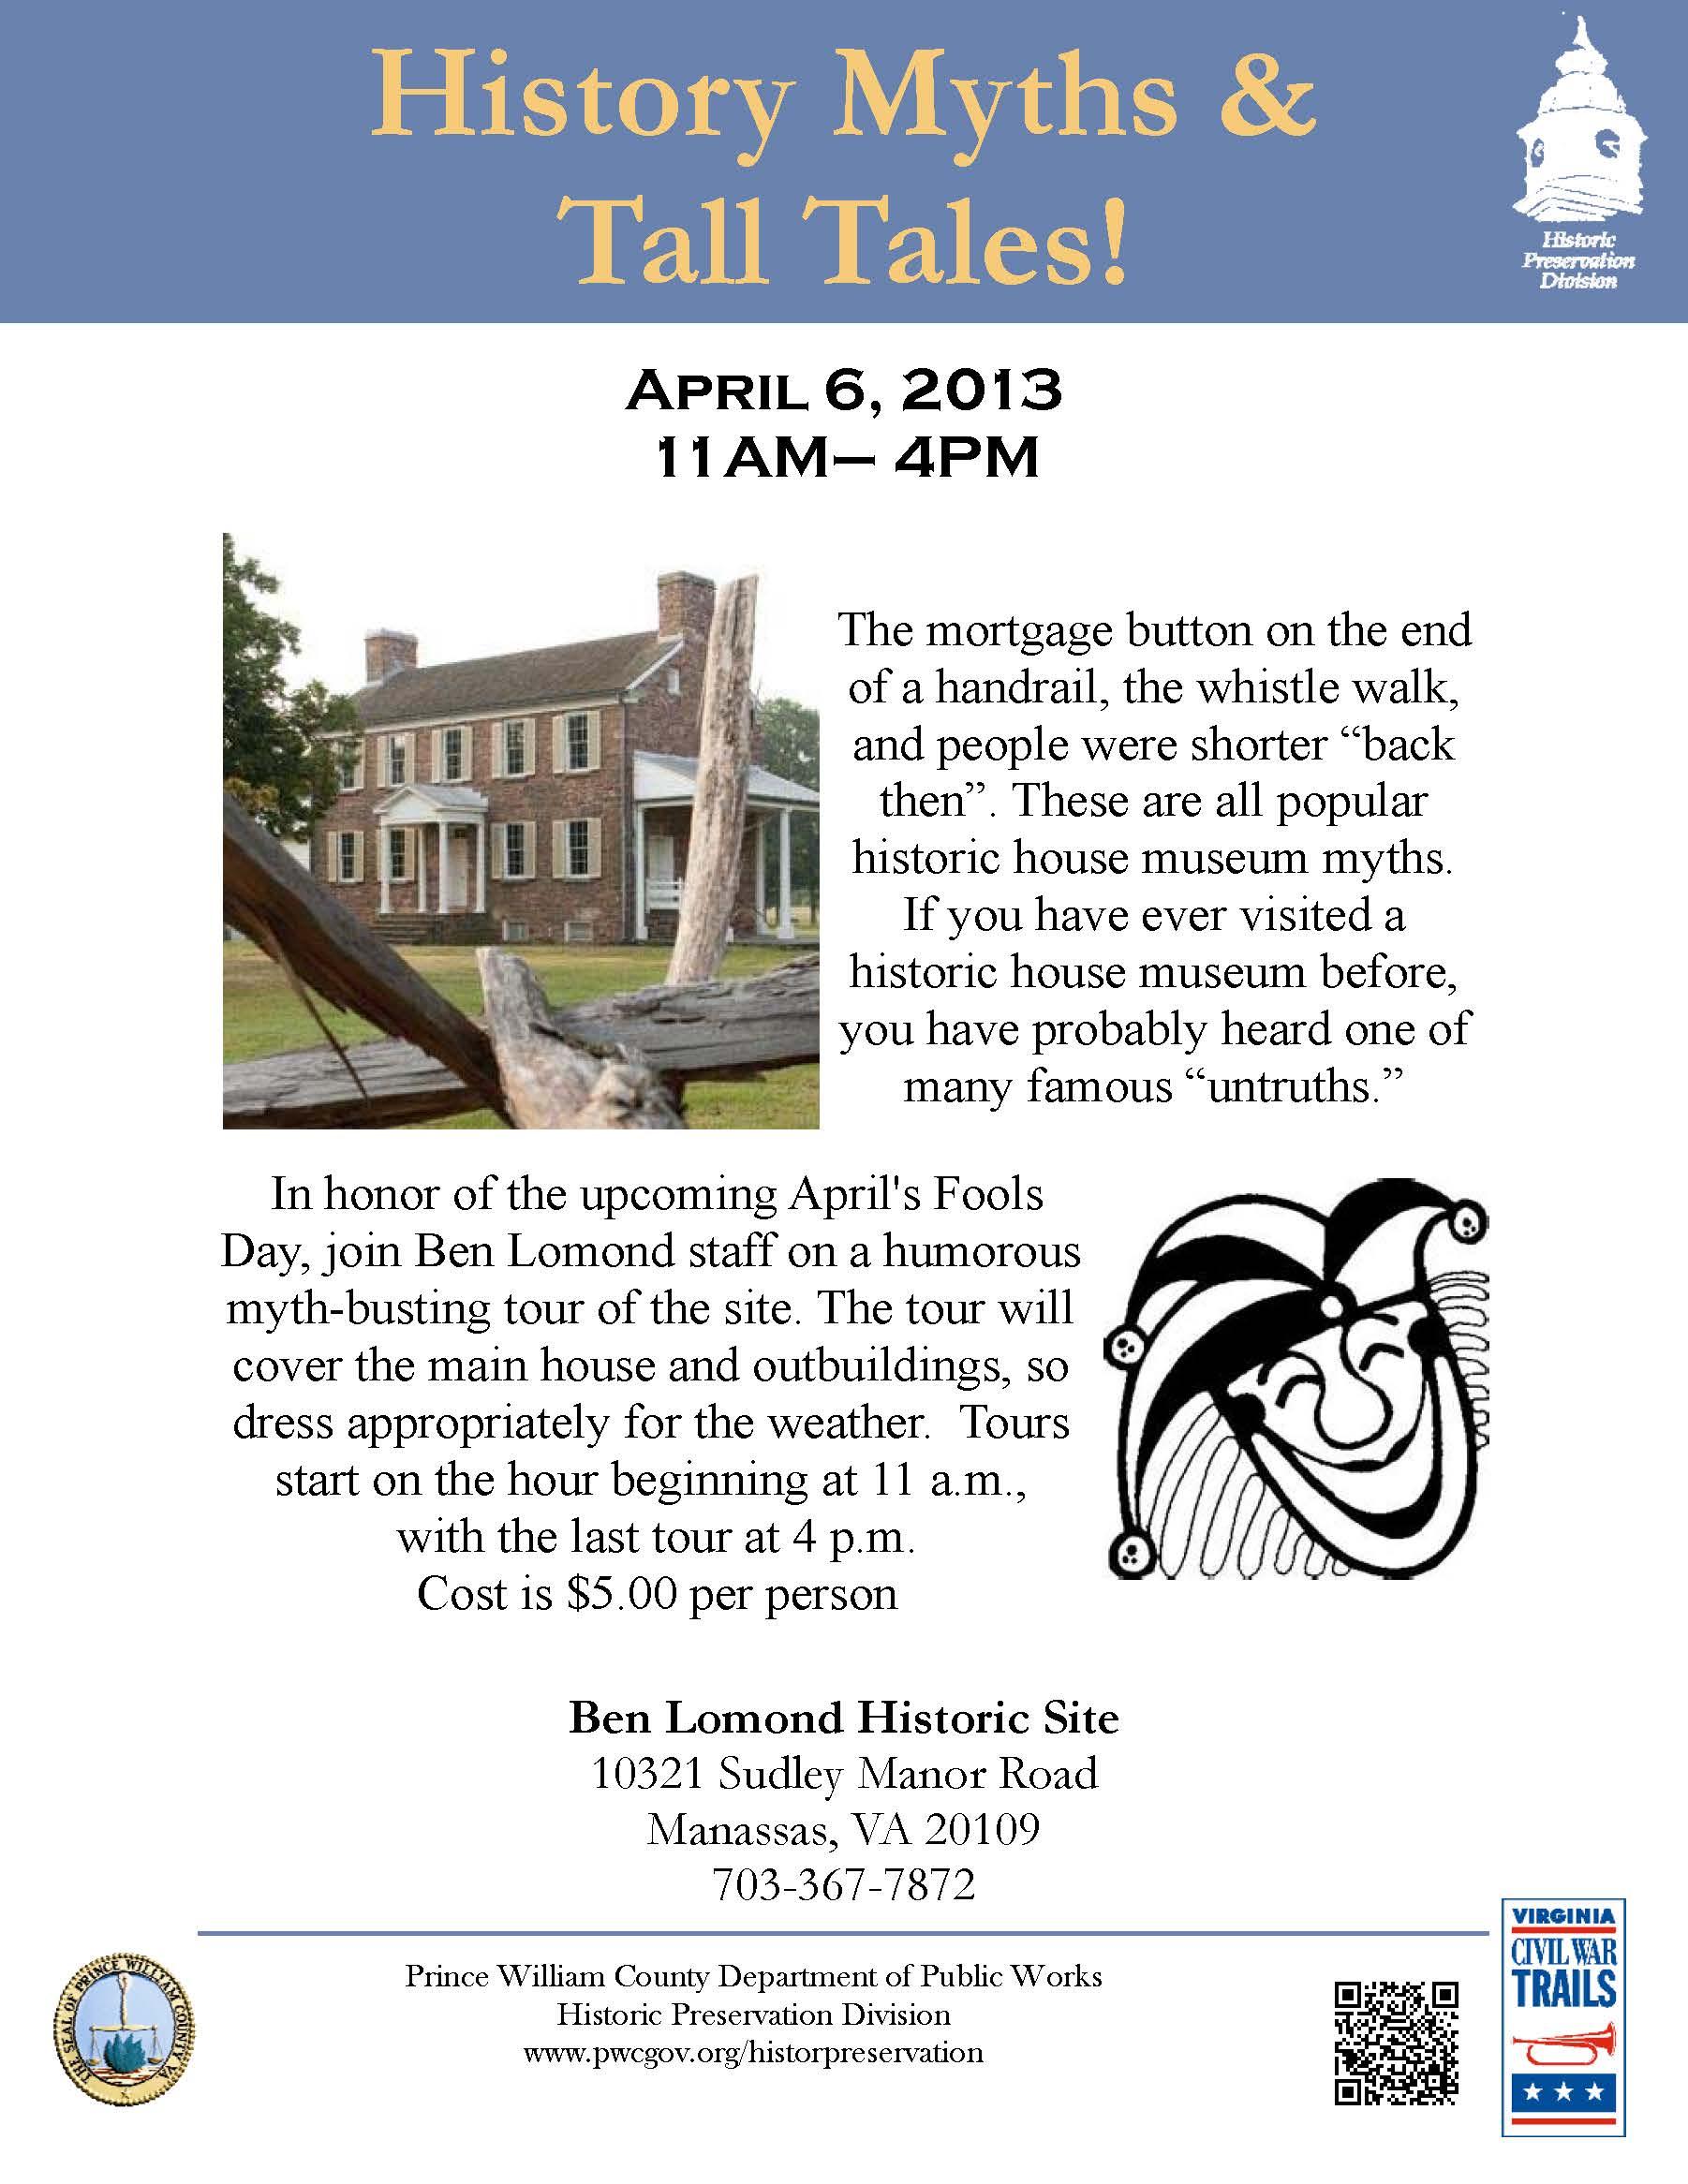 History Myths on April 6th